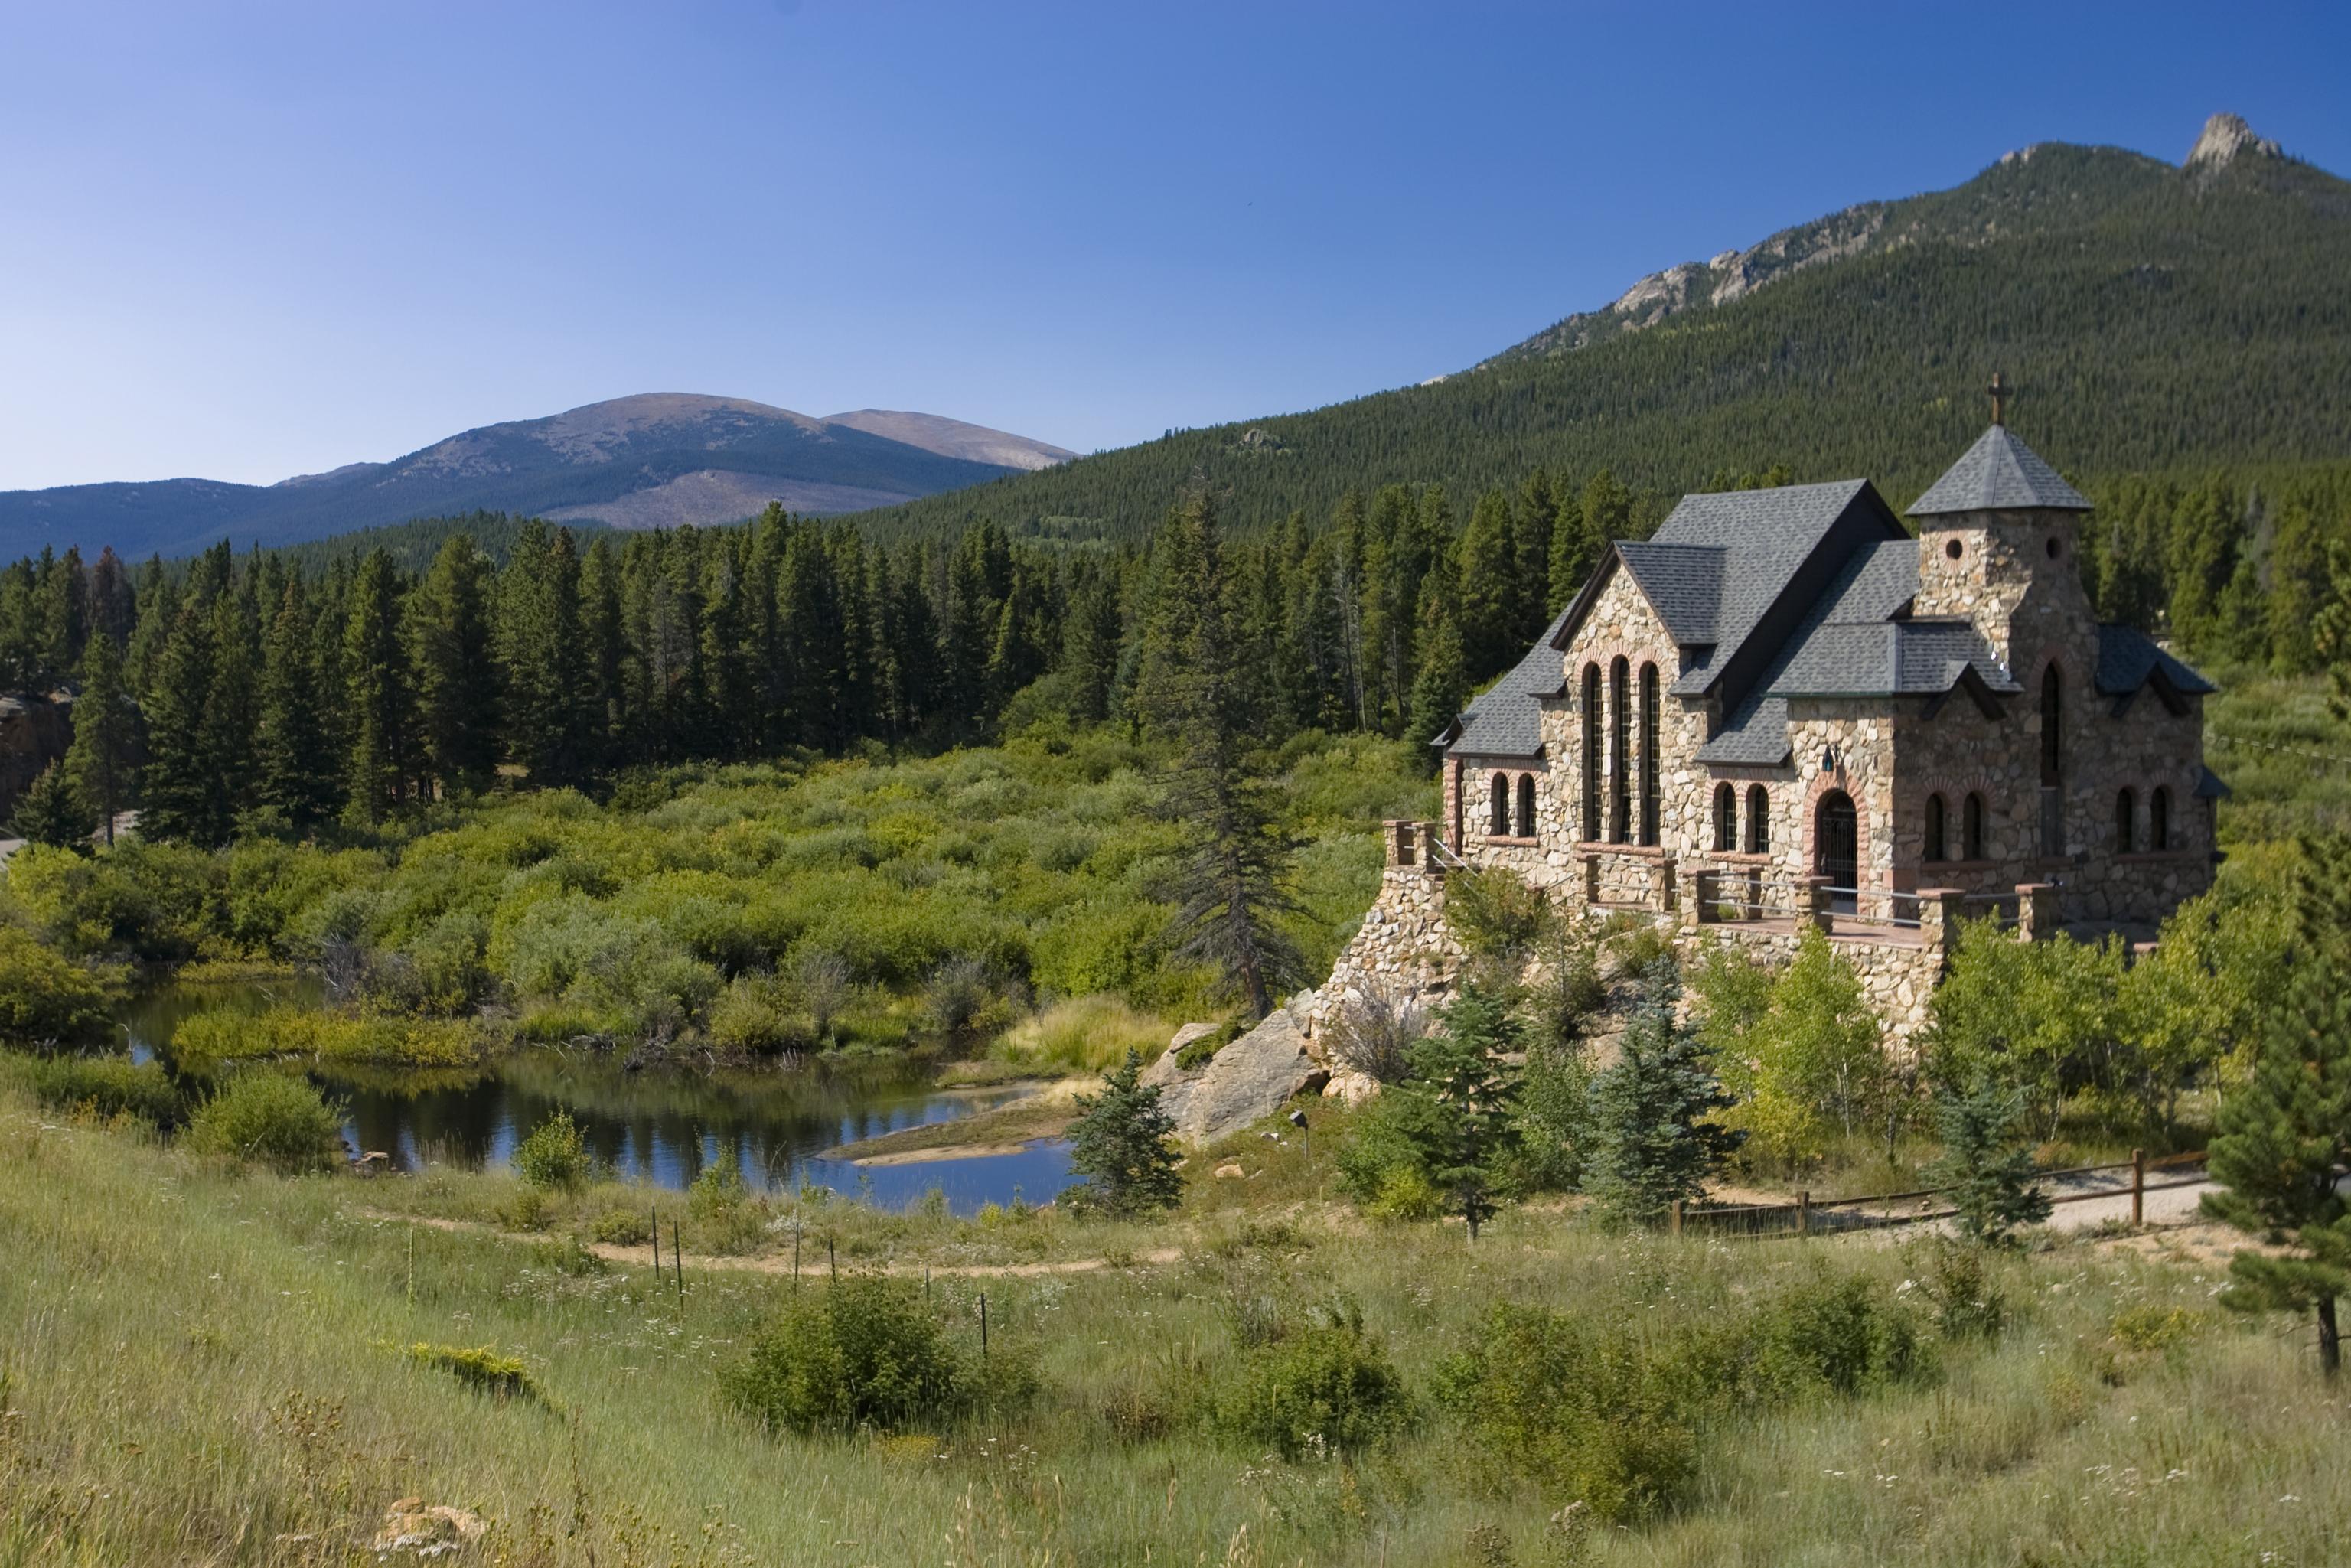 Picturesque Stone Chapel Near Estes Park Colorado